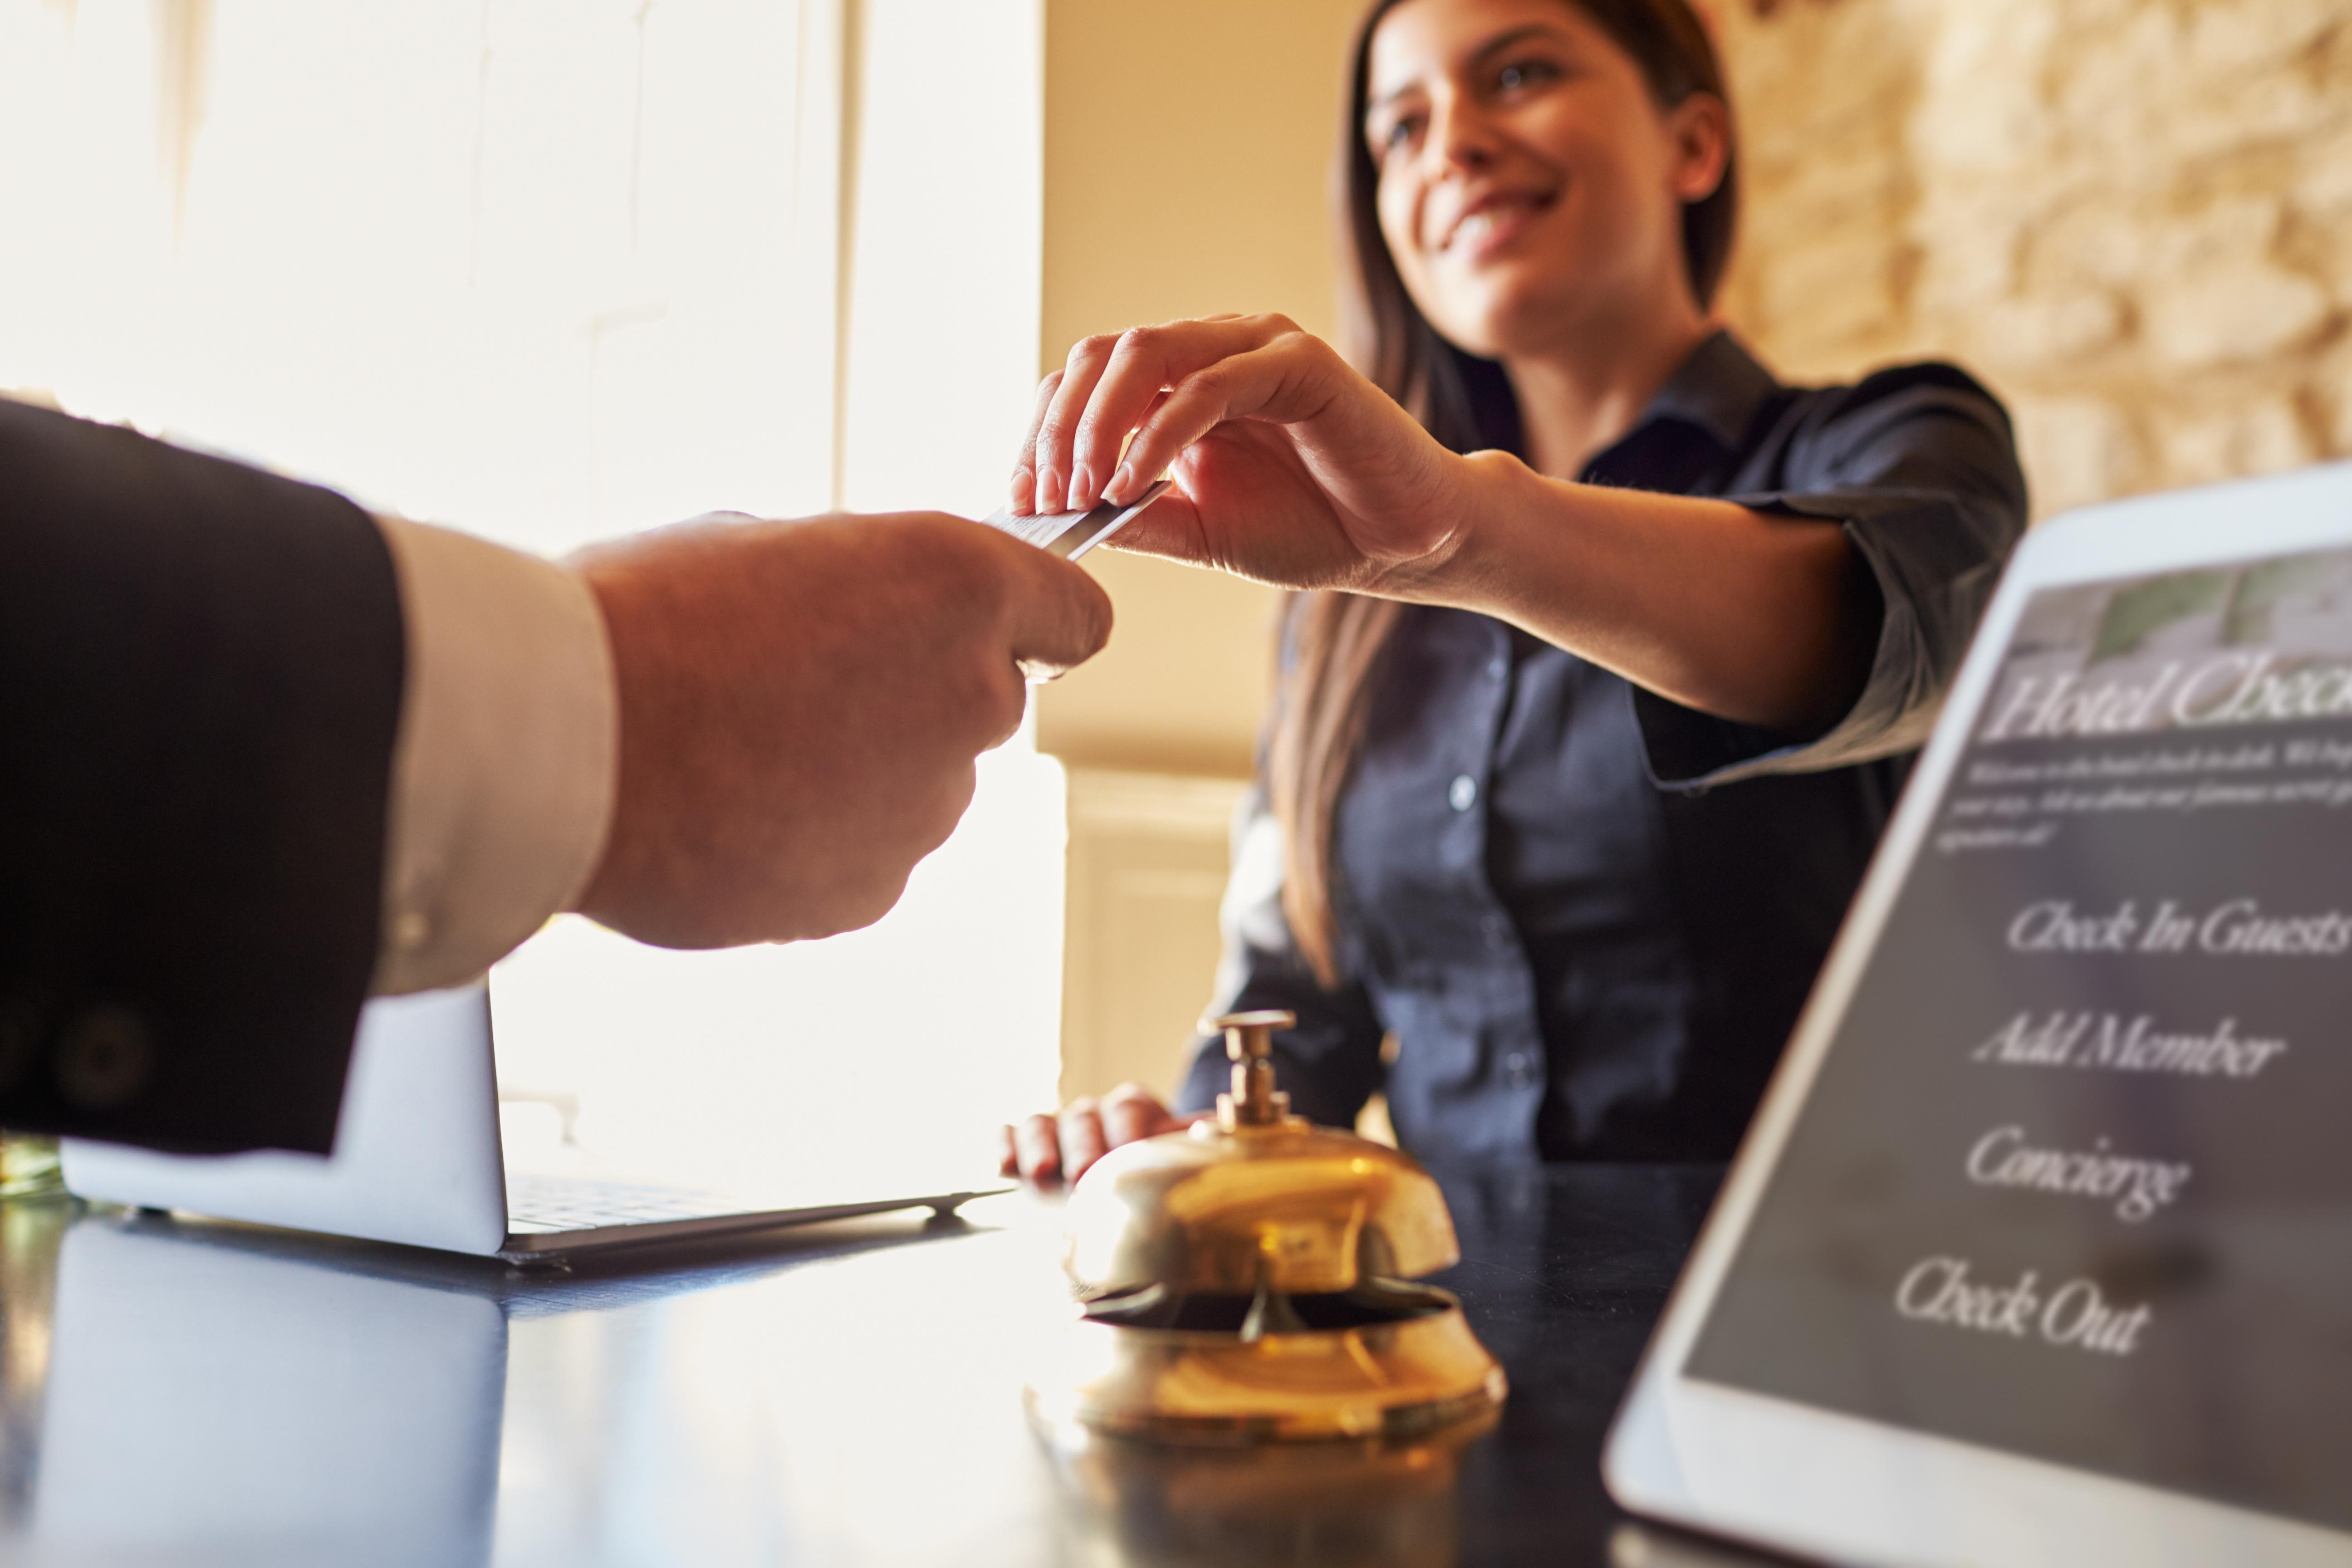 hotel revenue management training courses - The training Terminal